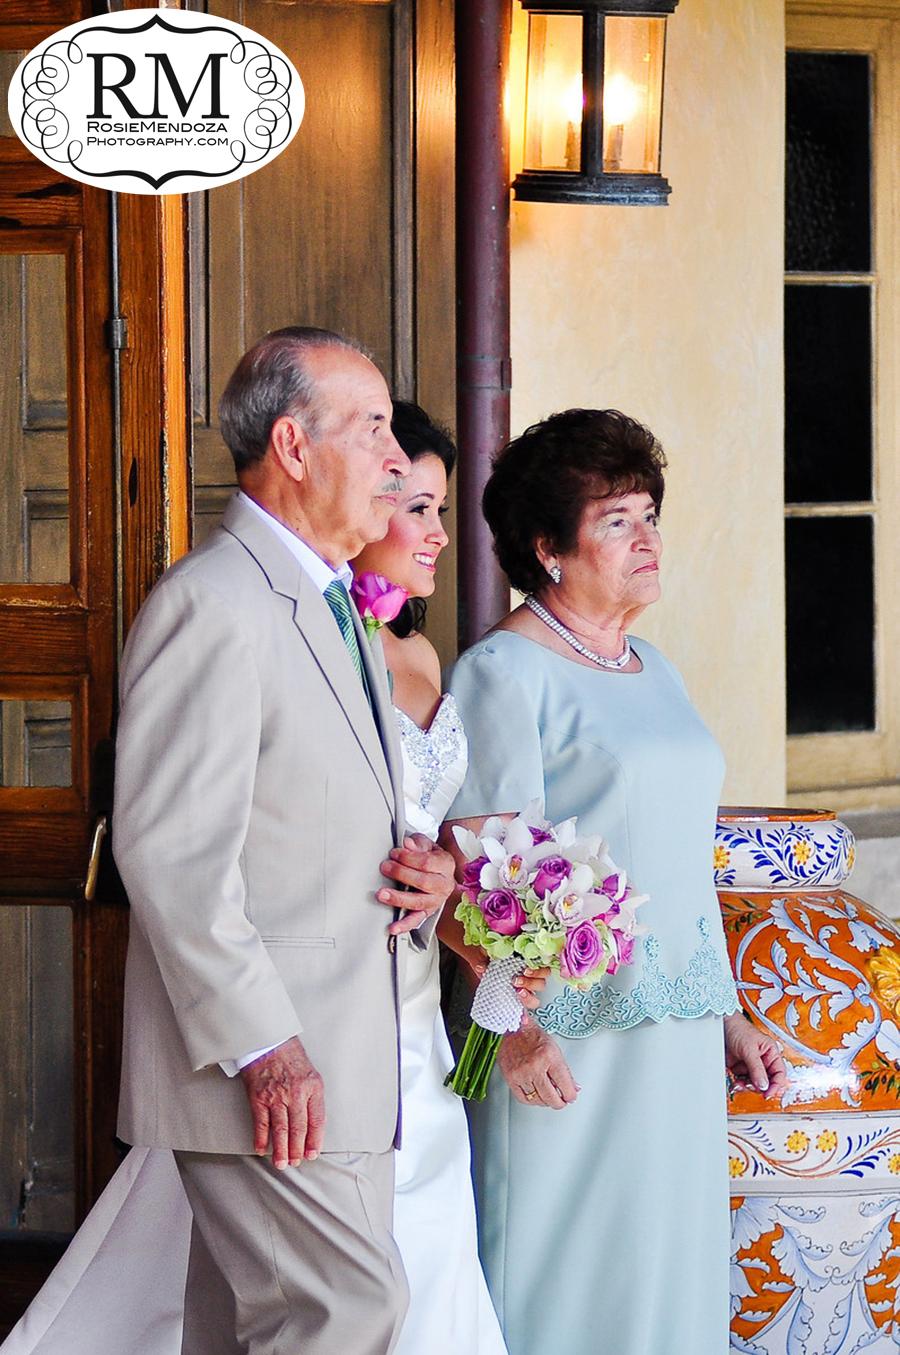 Boca-Raton-The-Addison-wedding-bride-walking-down-the-isle-photo